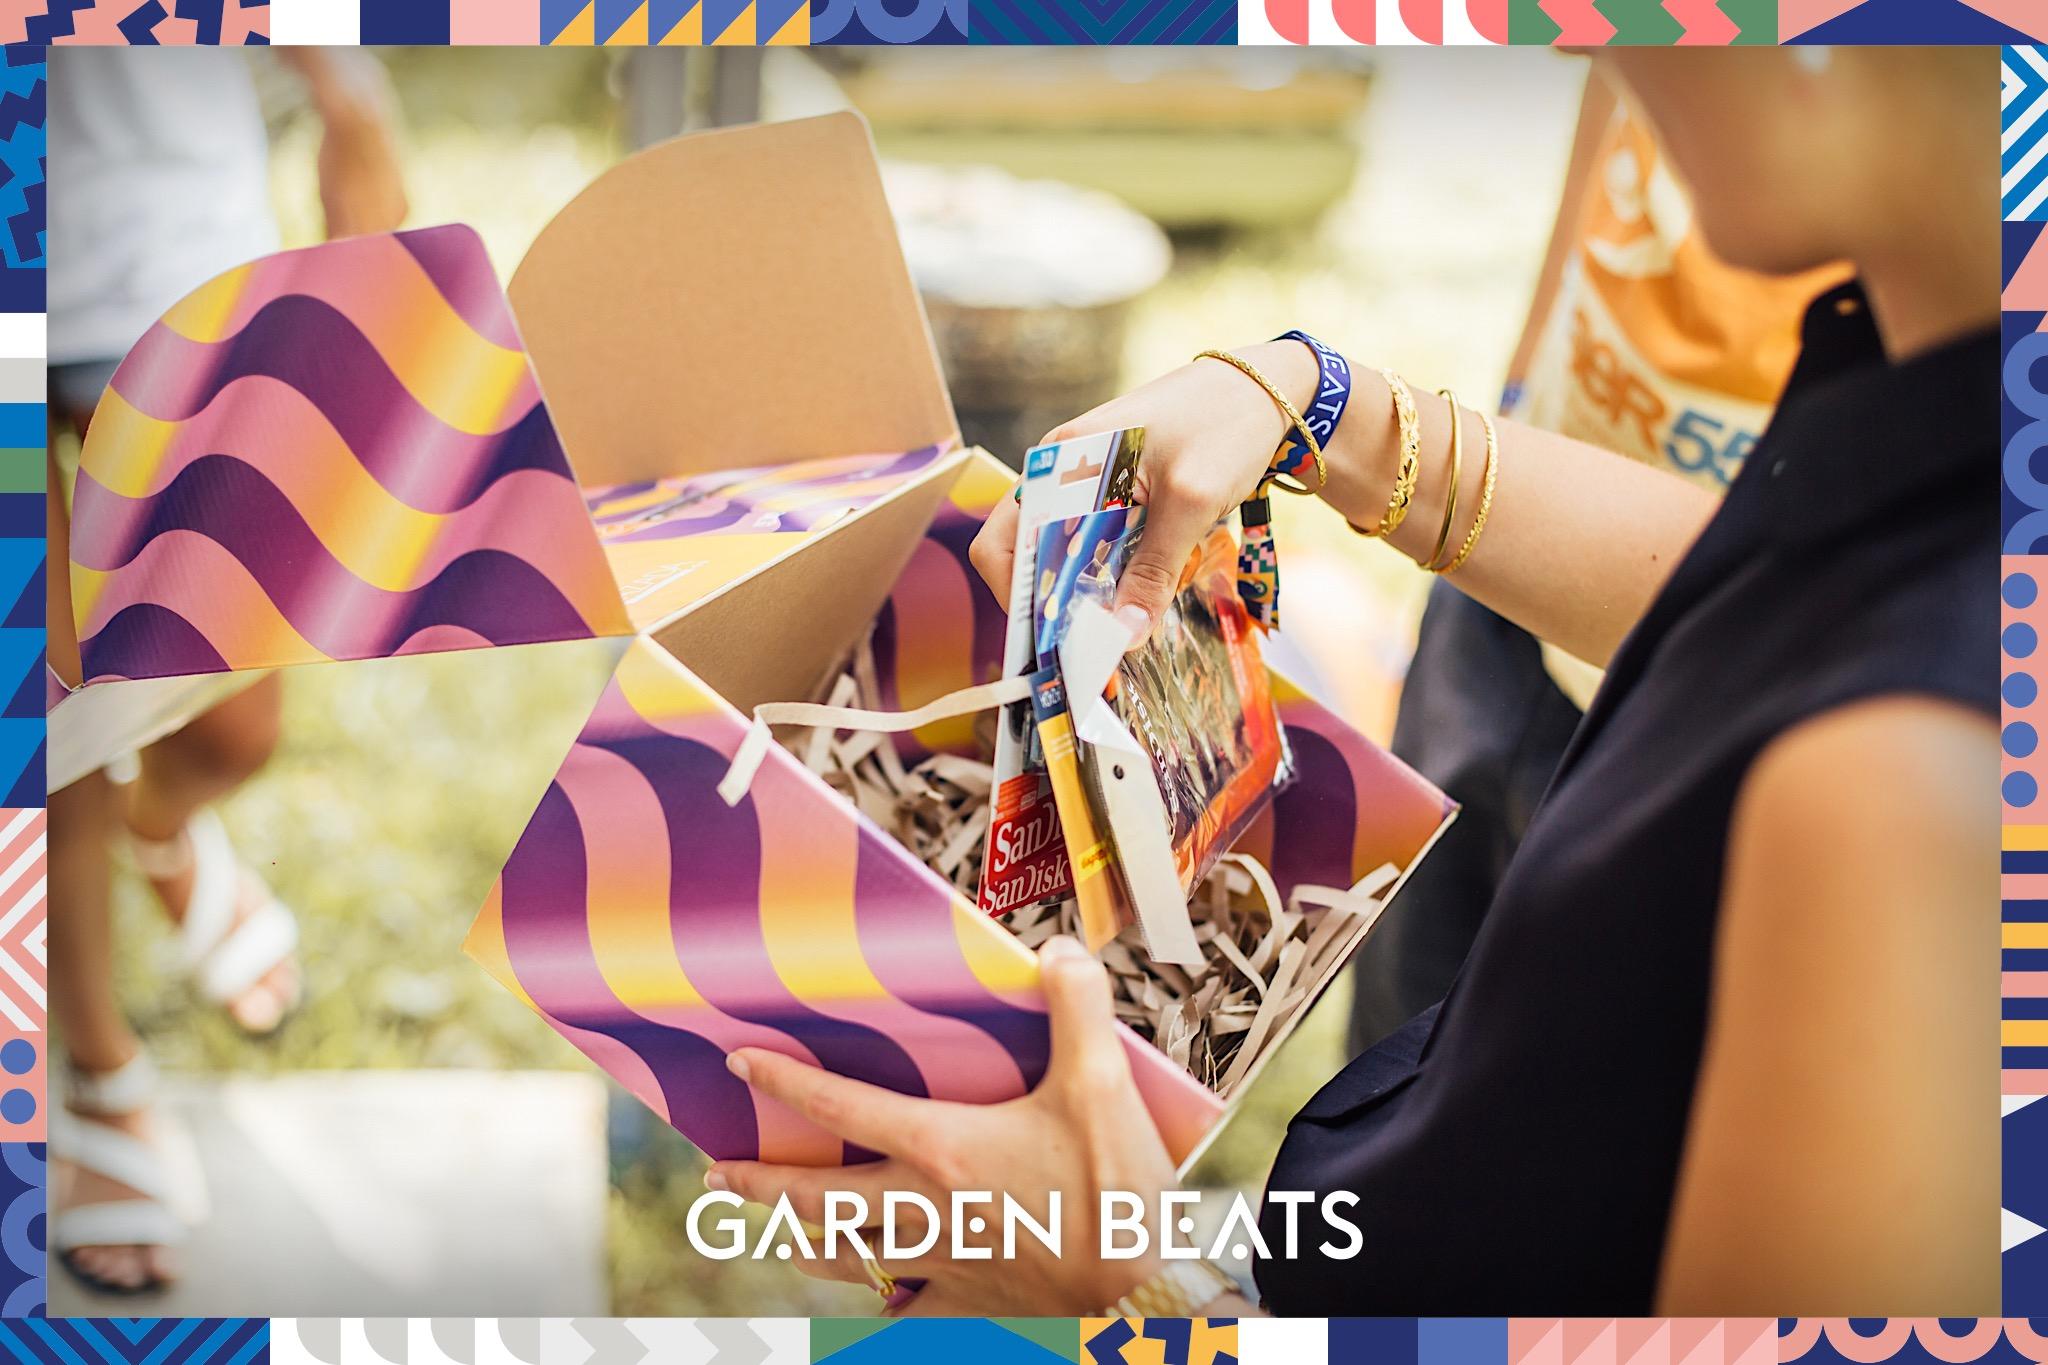 18032017_GardenBeats_Colossal176_WatermarkedGB.jpg